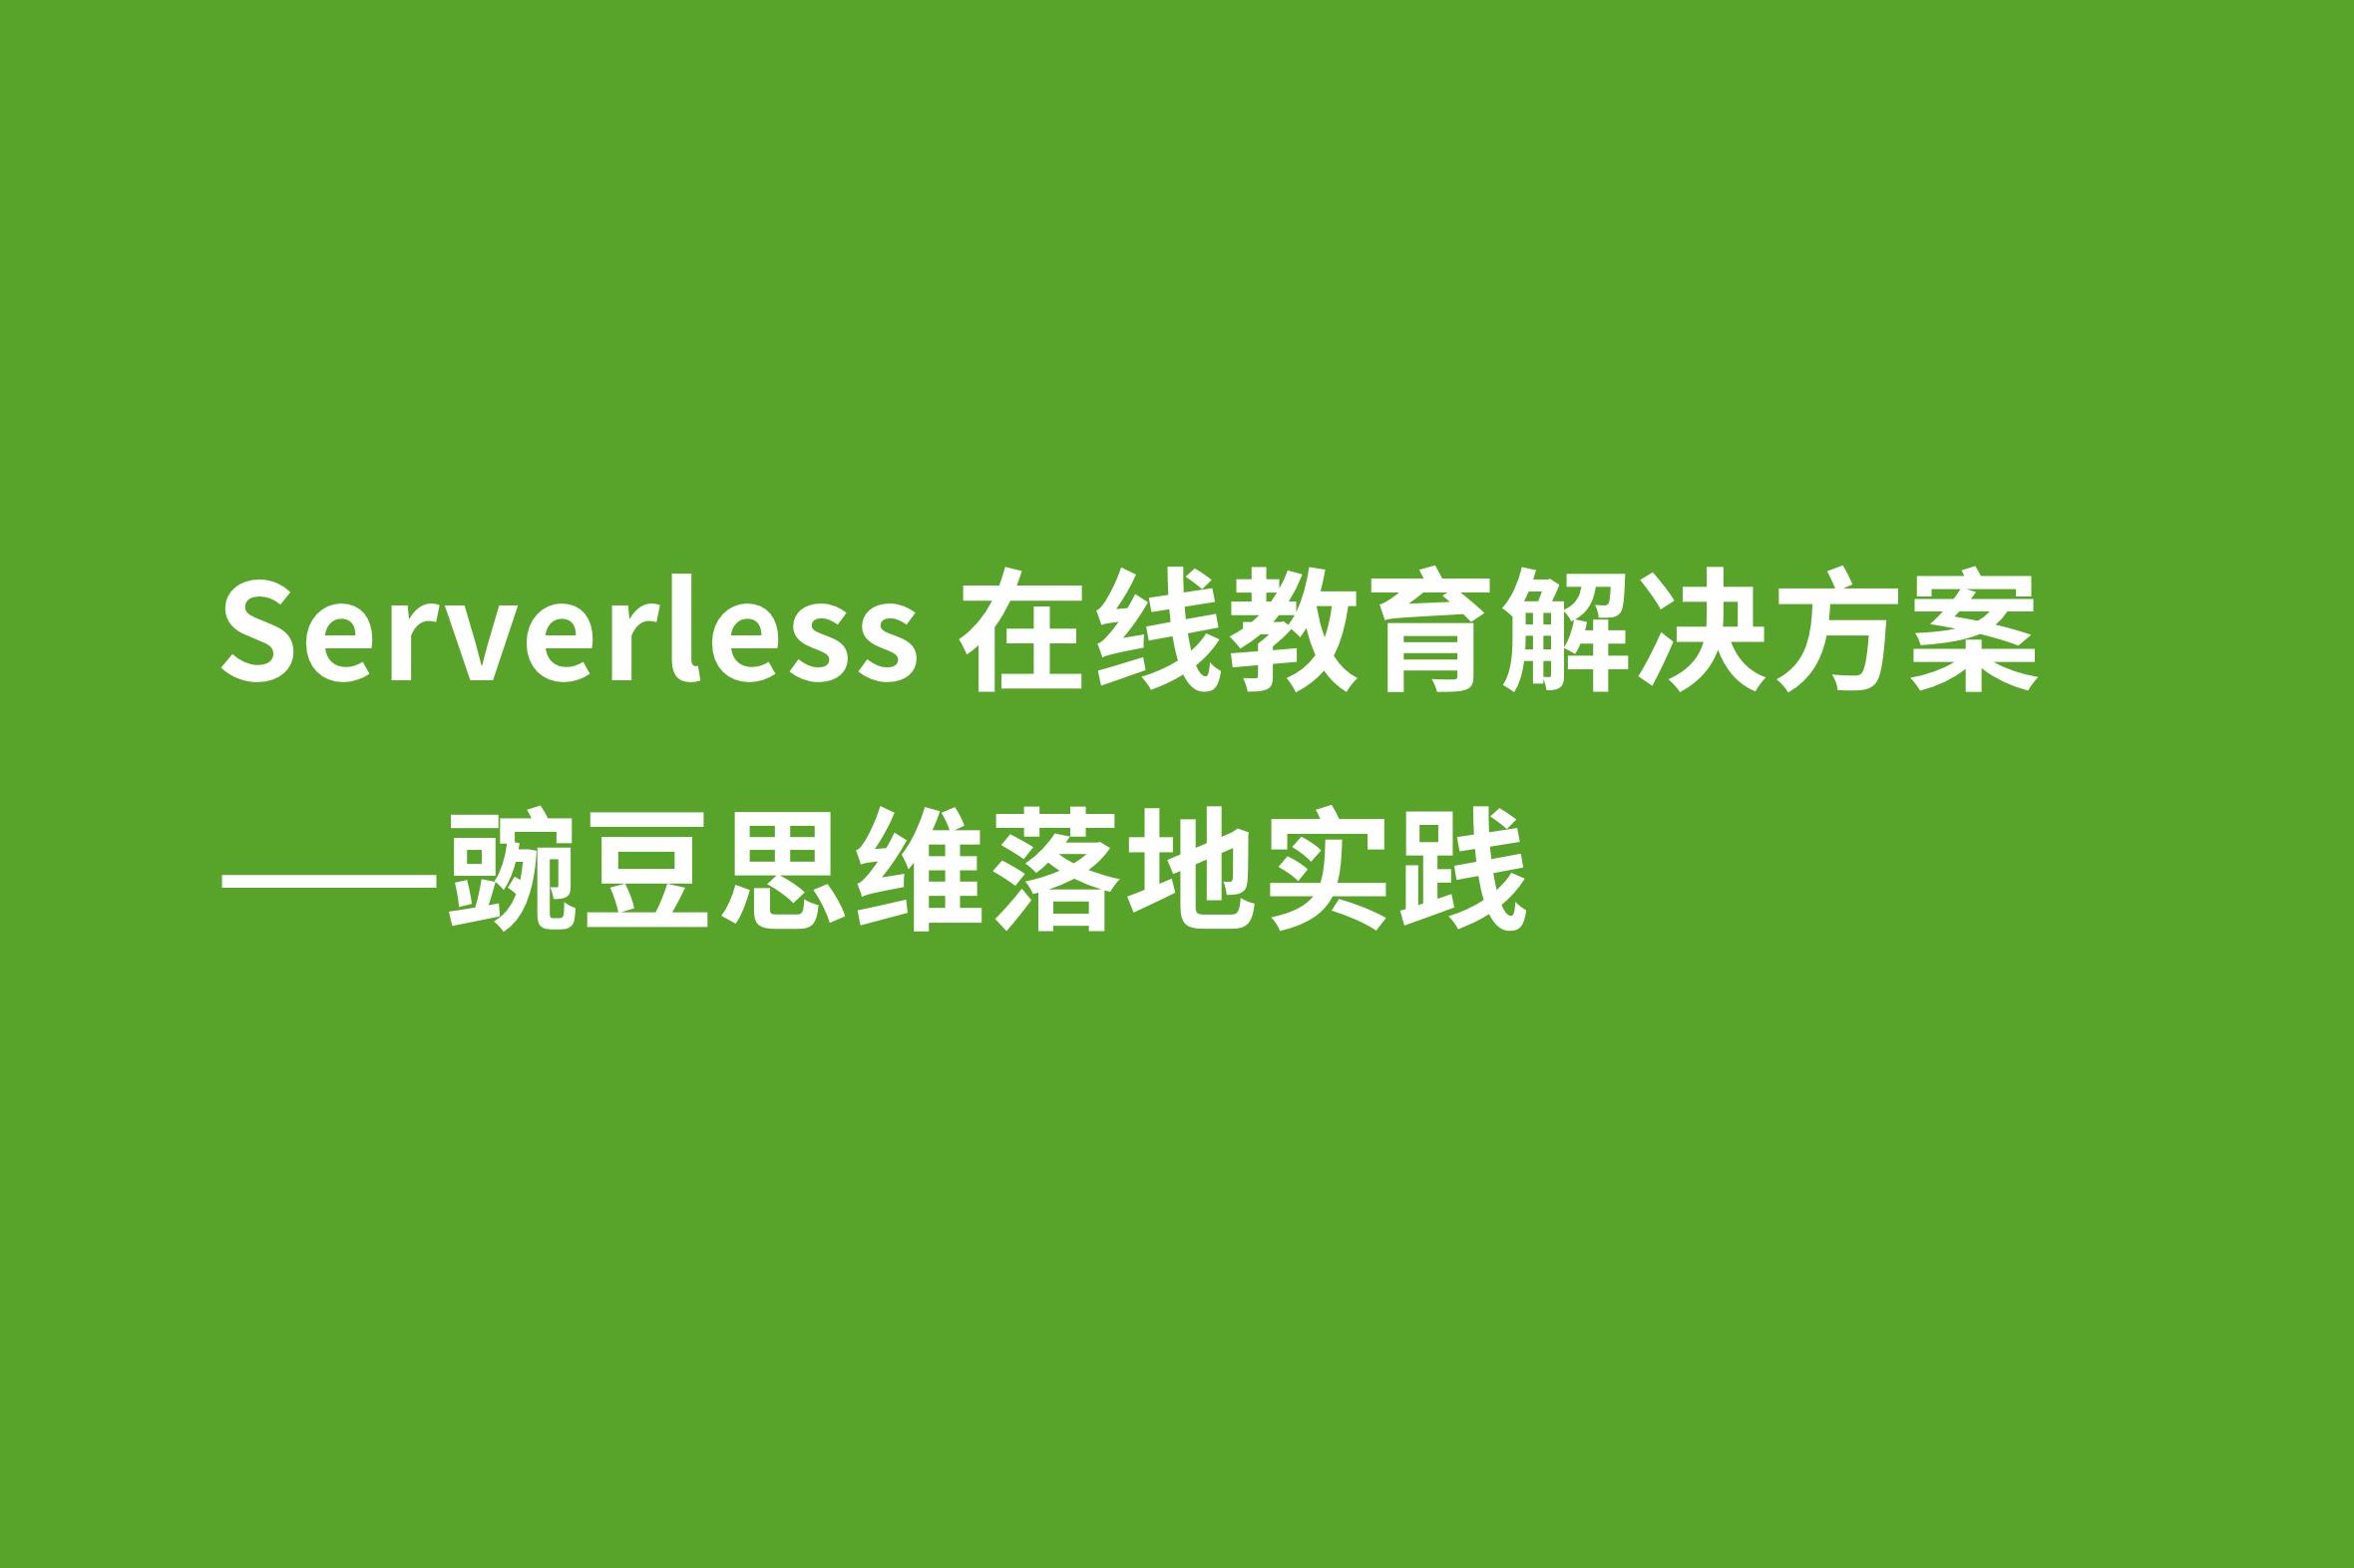 Serverless 在线教育解决方案:豌豆思维落地实践